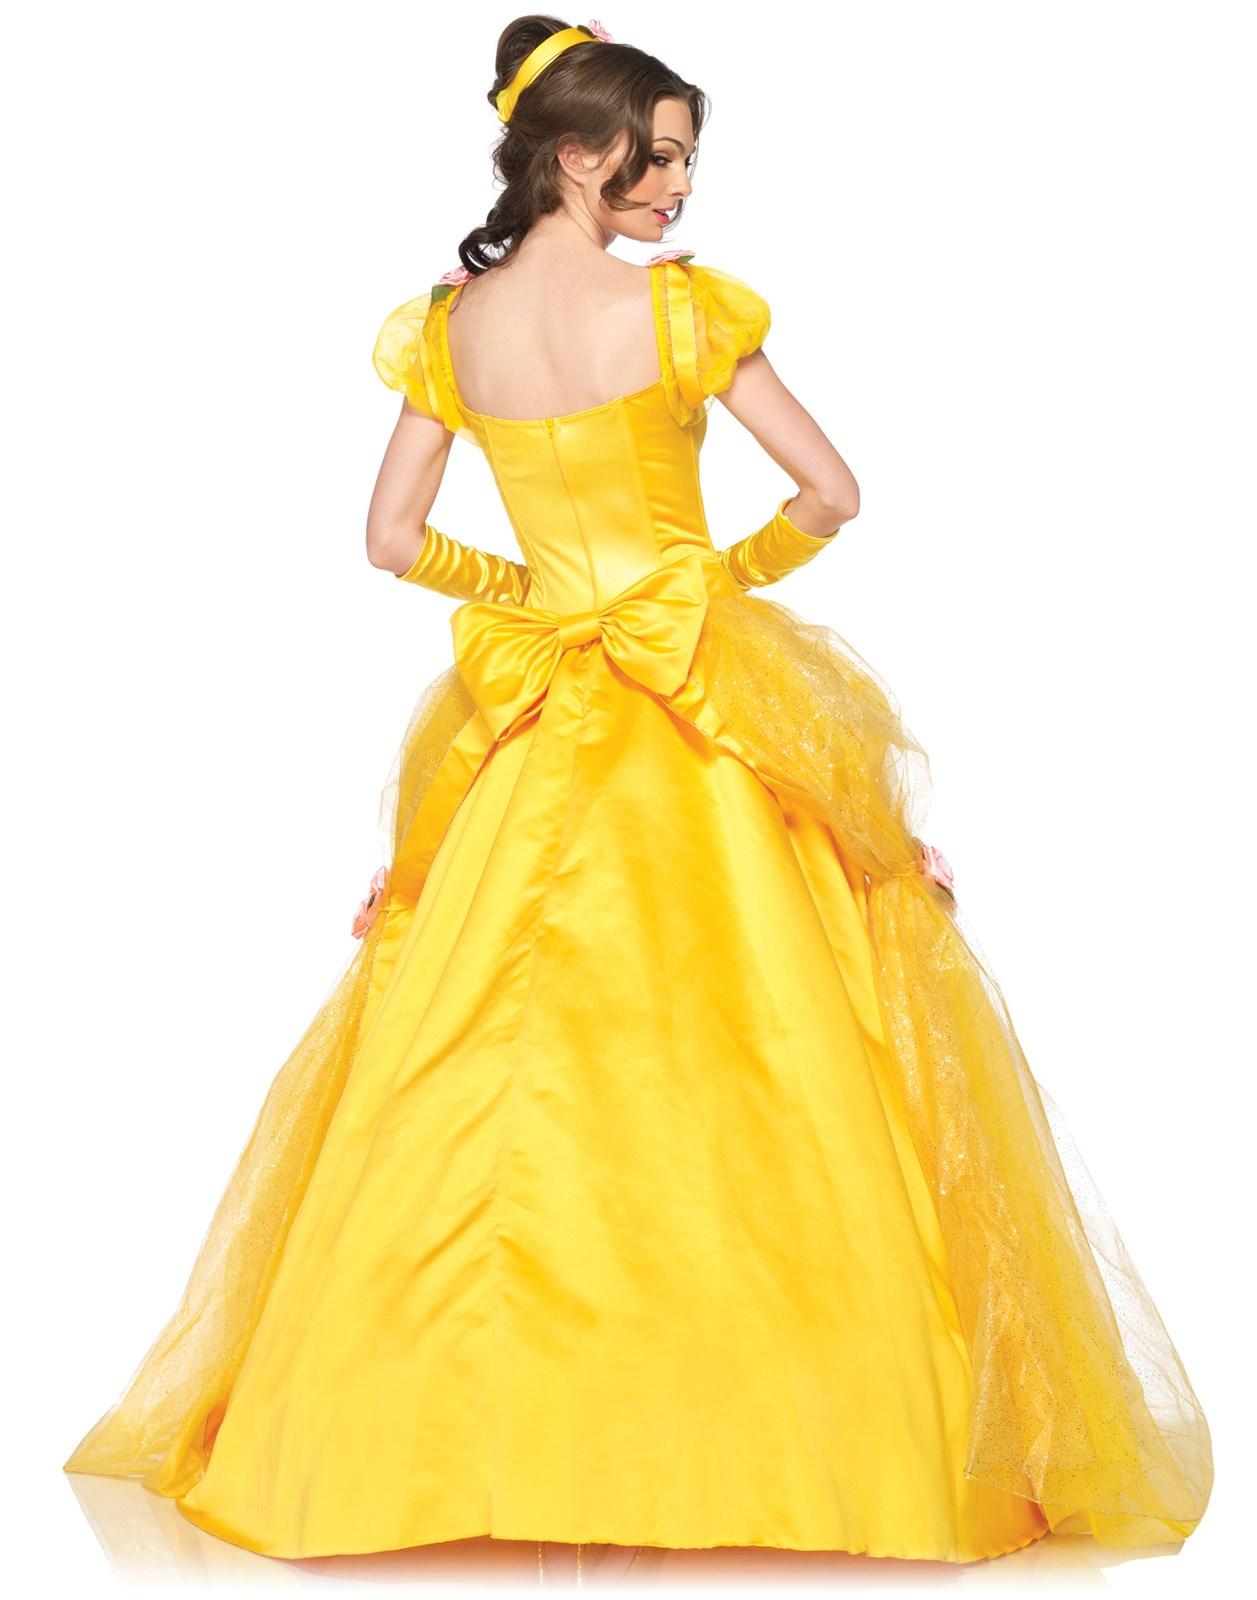 Disney princess gowns for adults -  Alt Image 1 Disney Princesses Enchanting Belle Deluxe Adult Costume